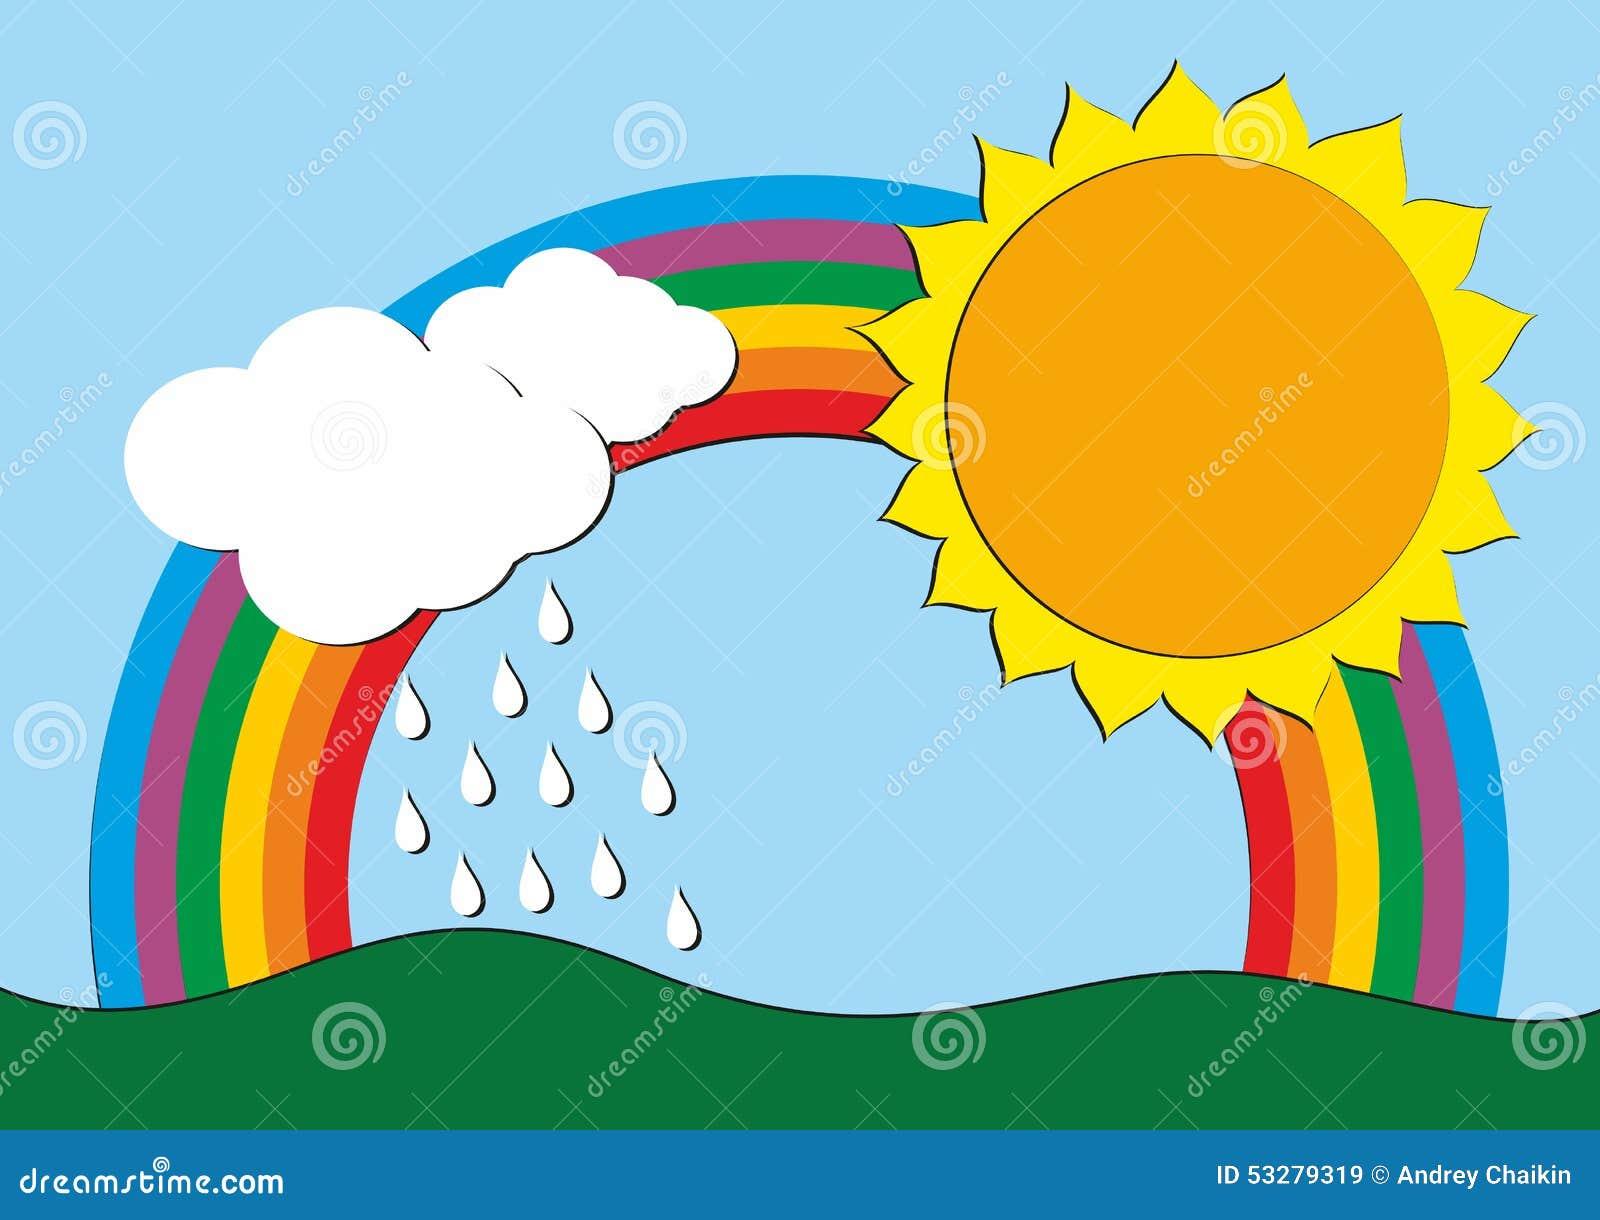 Dessin avec un arc en ciel illustration de vecteur image - Dessin arc en ciel ...